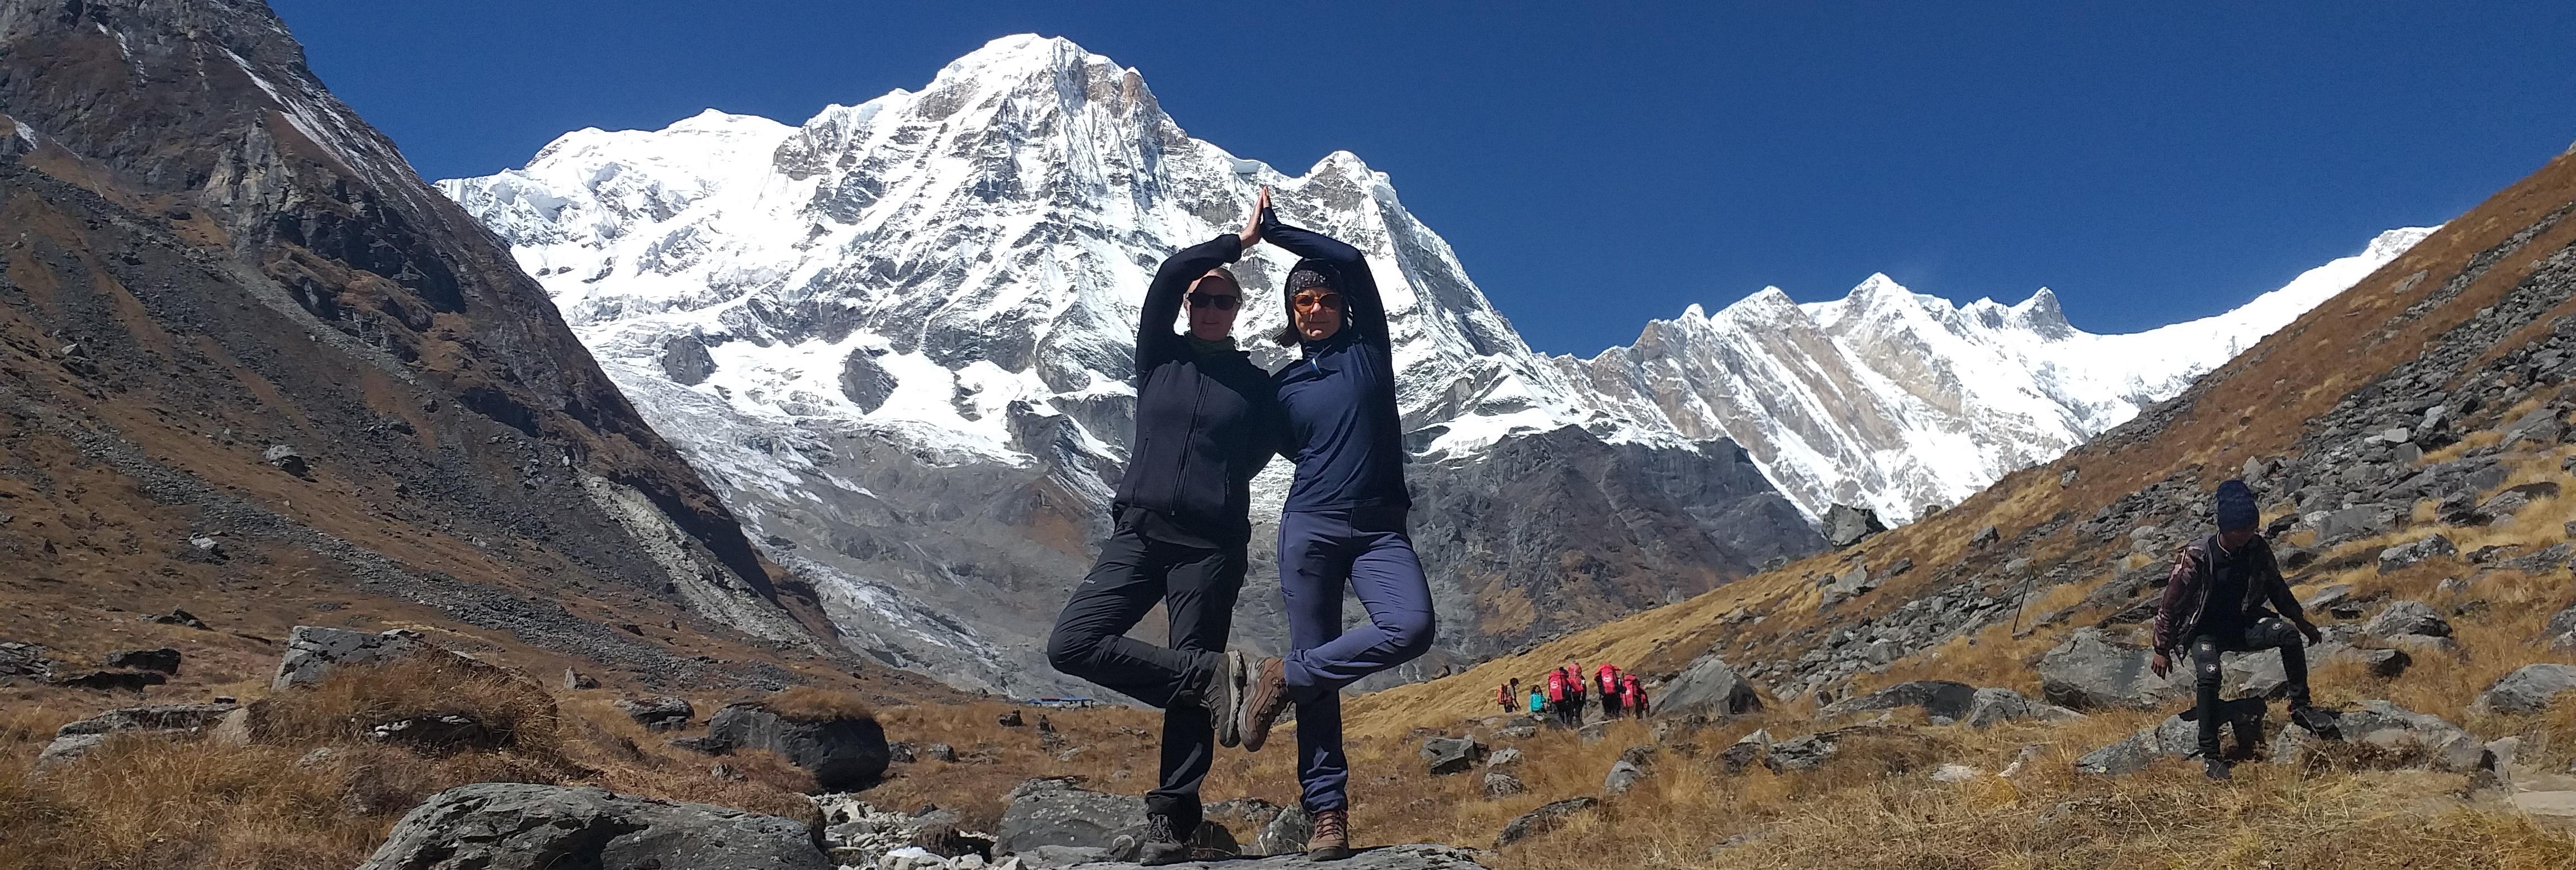 Tiefenentspannung und Energie tanken Yoga, Ayurveda and Trekking in Himalaya